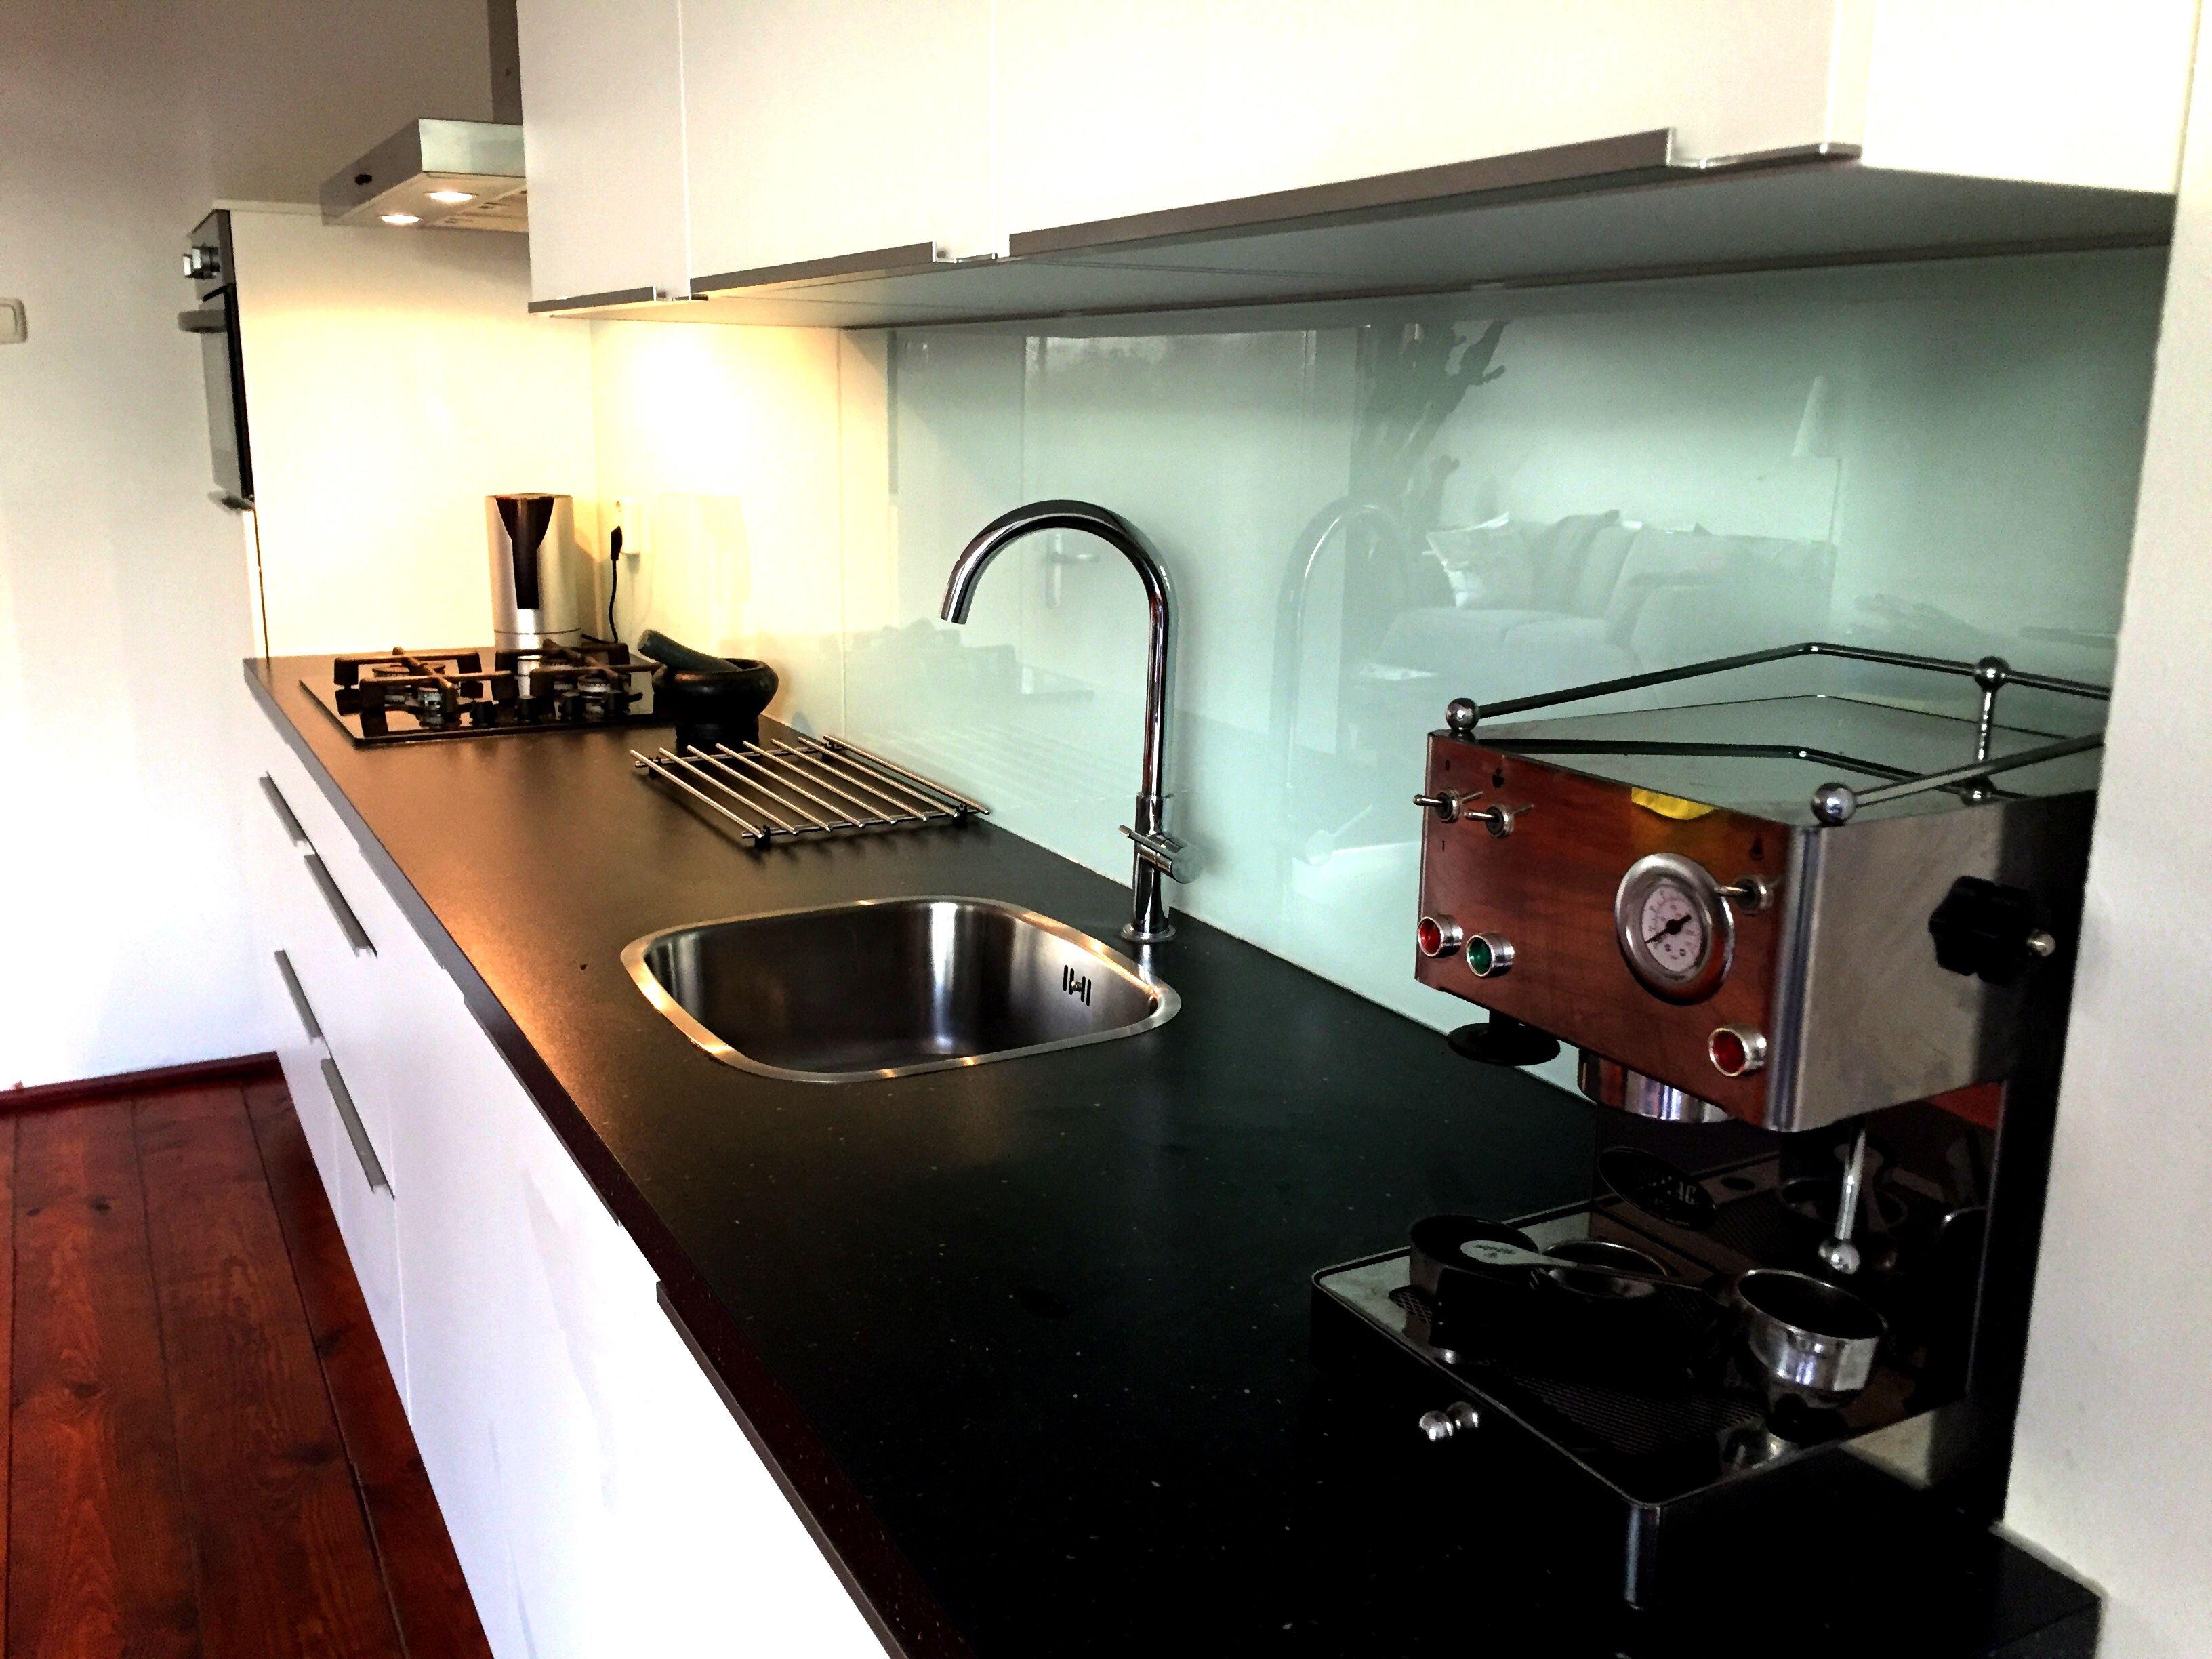 Melkglas Keuken Achterwand : Glazen keukenachterwand in authenitiek melkglas groenigwit glas